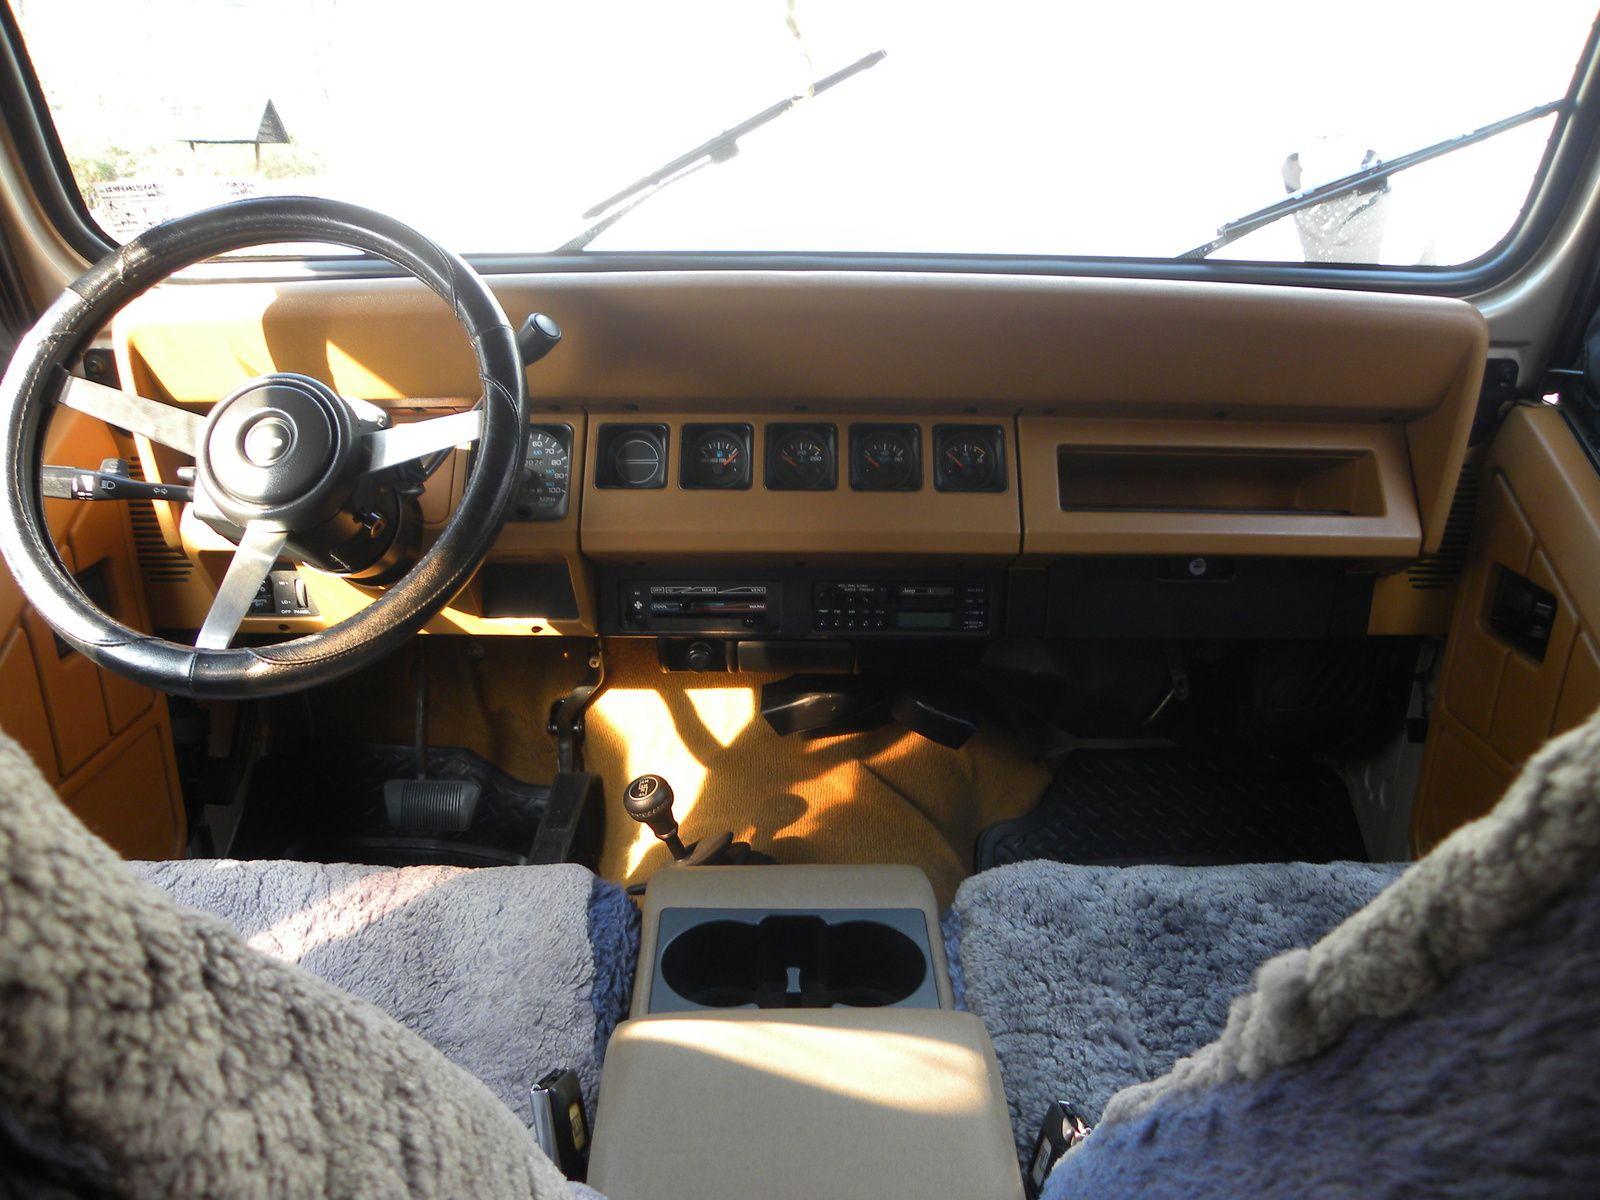 Picture of 1995 Jeep Wrangler S, interior Jeep